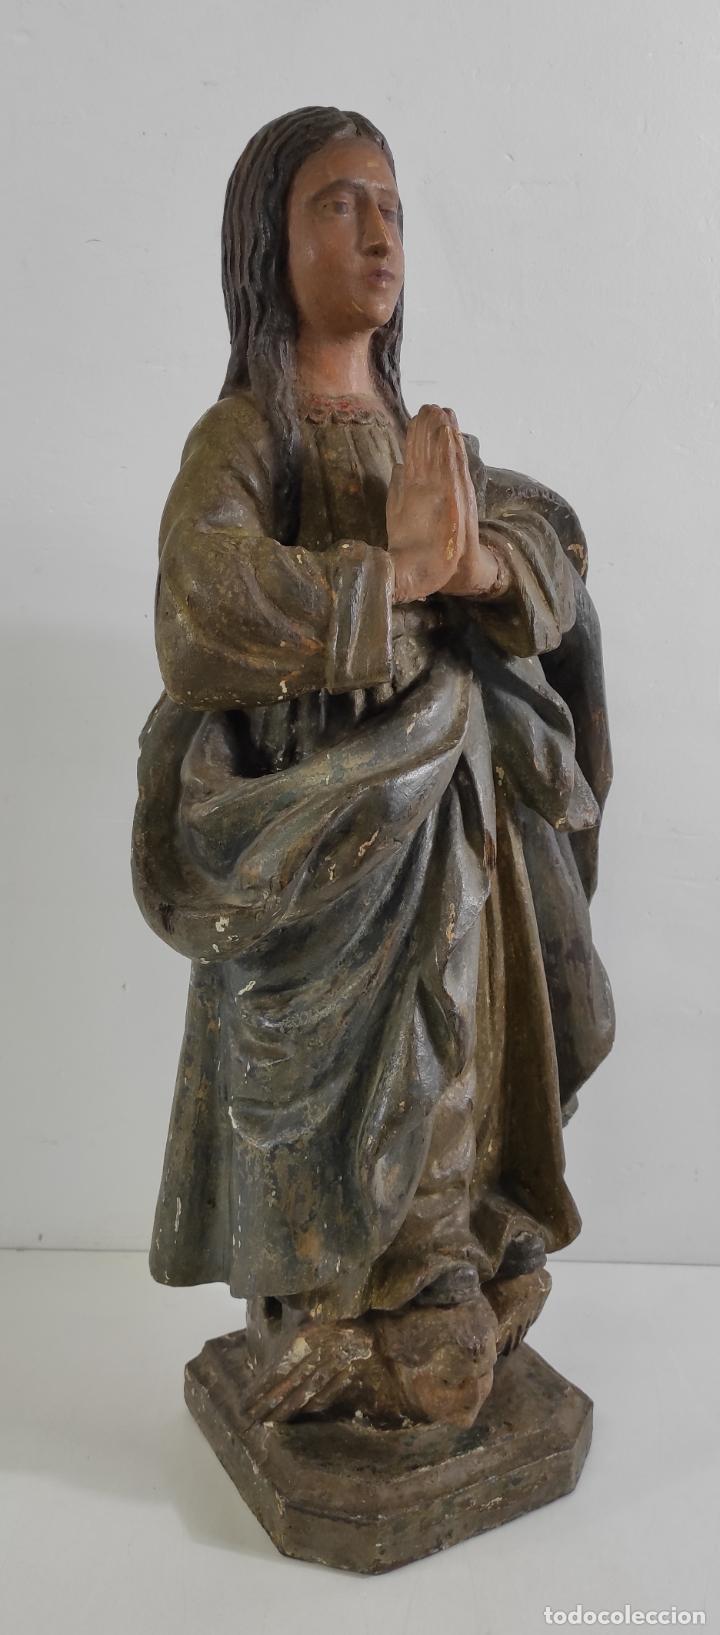 Arte: Virgen Purísima - Talla Popular en Madera de Encina Policromada - Escuela Catalana - S. XVII - Foto 19 - 254490140